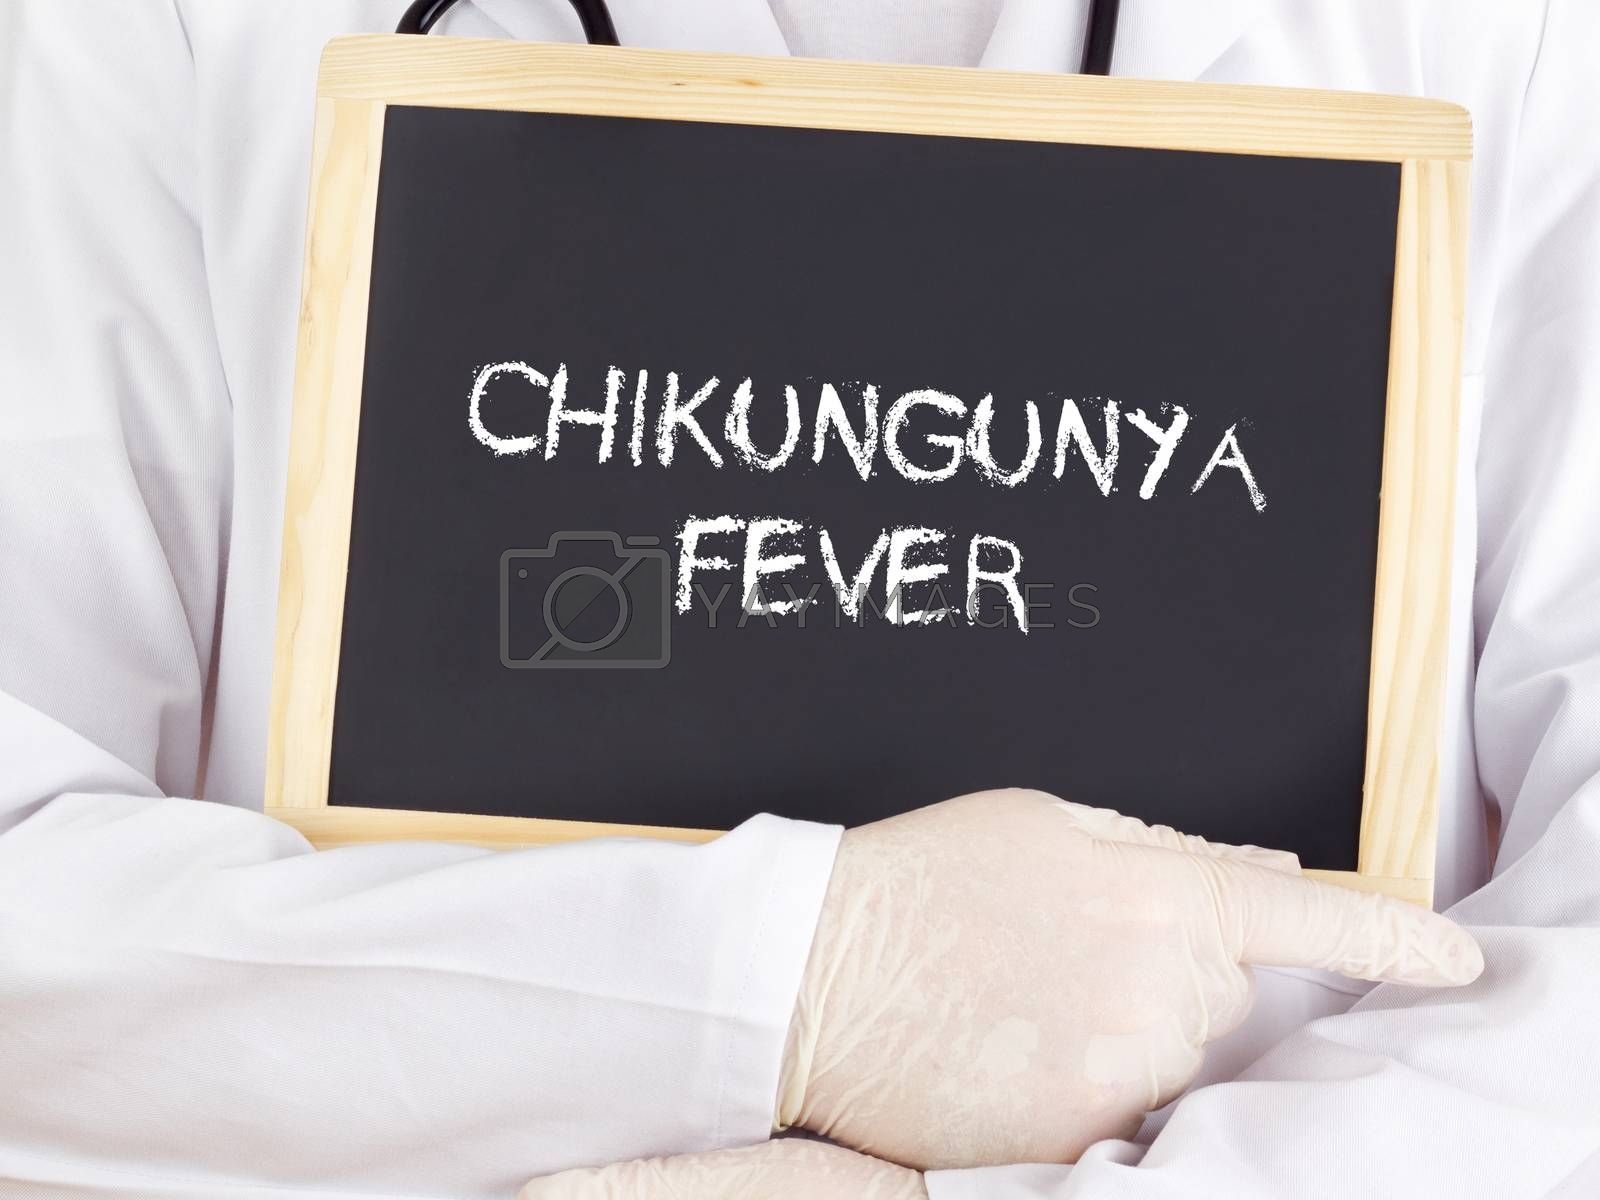 Doctor shows information on blackboard: Chikungunya fever